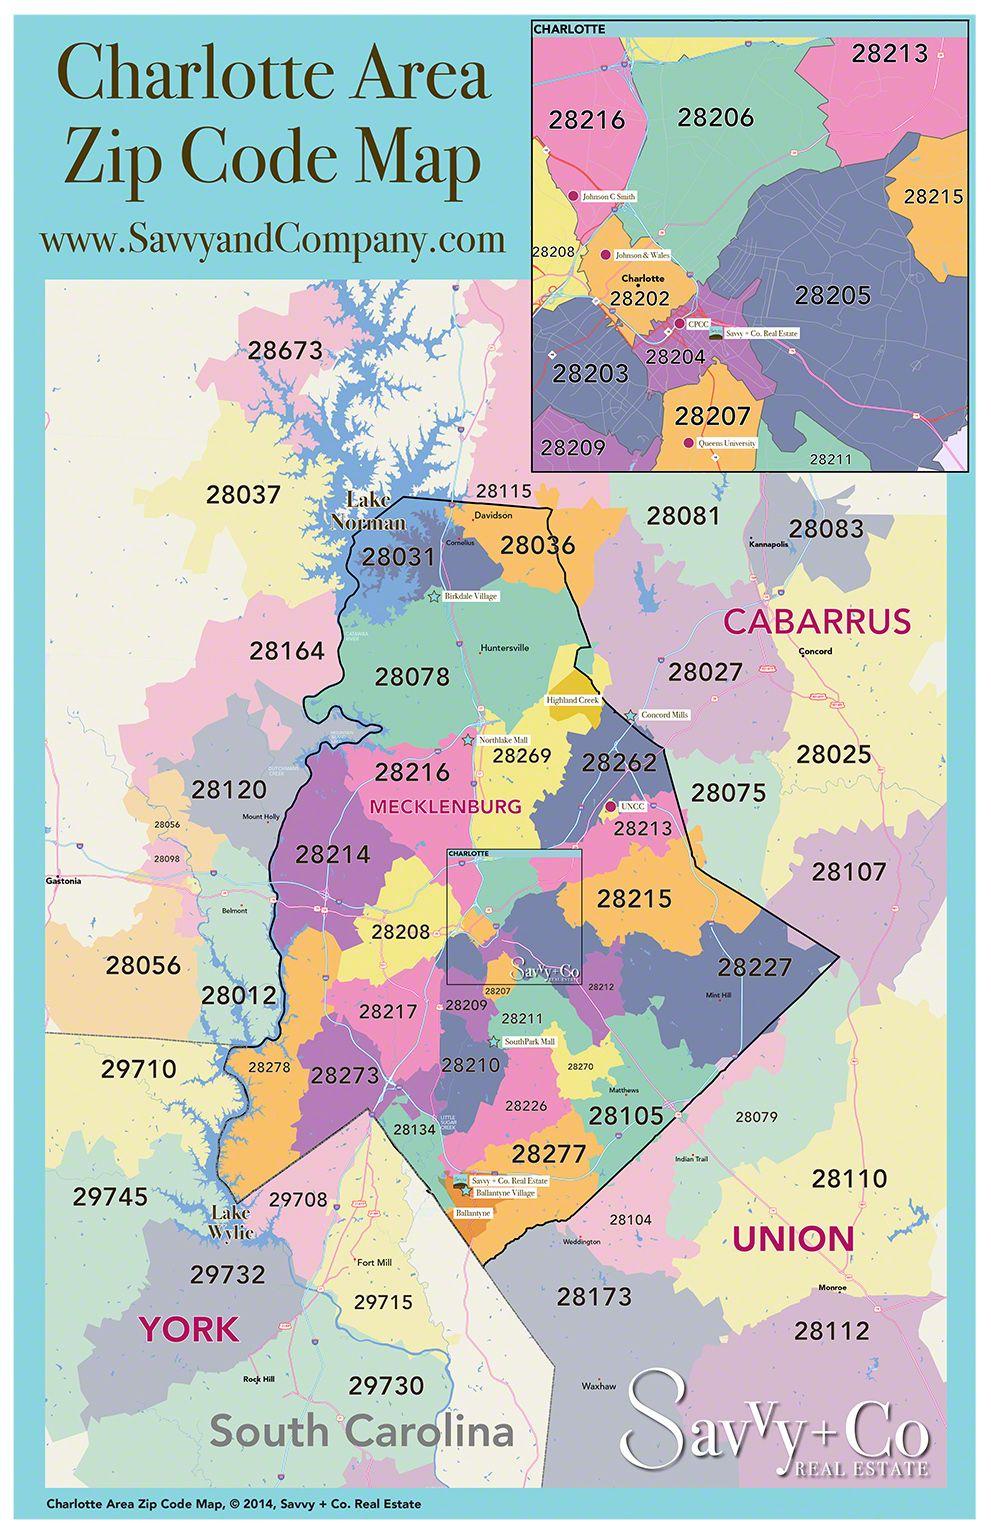 Charlotte NC Area Zip Code Map We Are Charlottes Neighborhood - Charlotte usa airport map